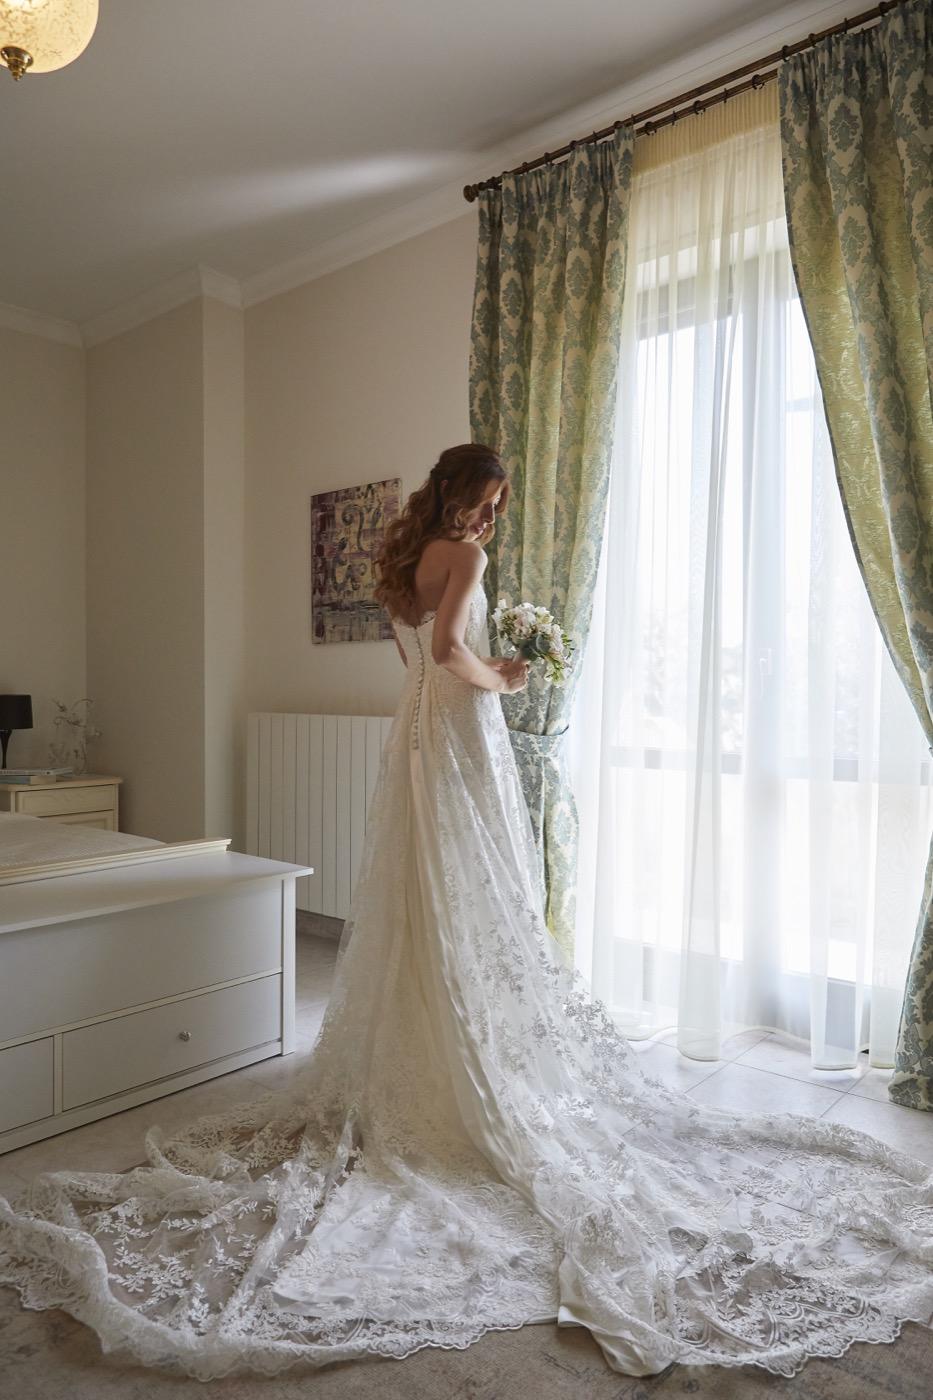 Claudio-Coppola-wedding-photographer-abbazia-7-frati-piegaro-32